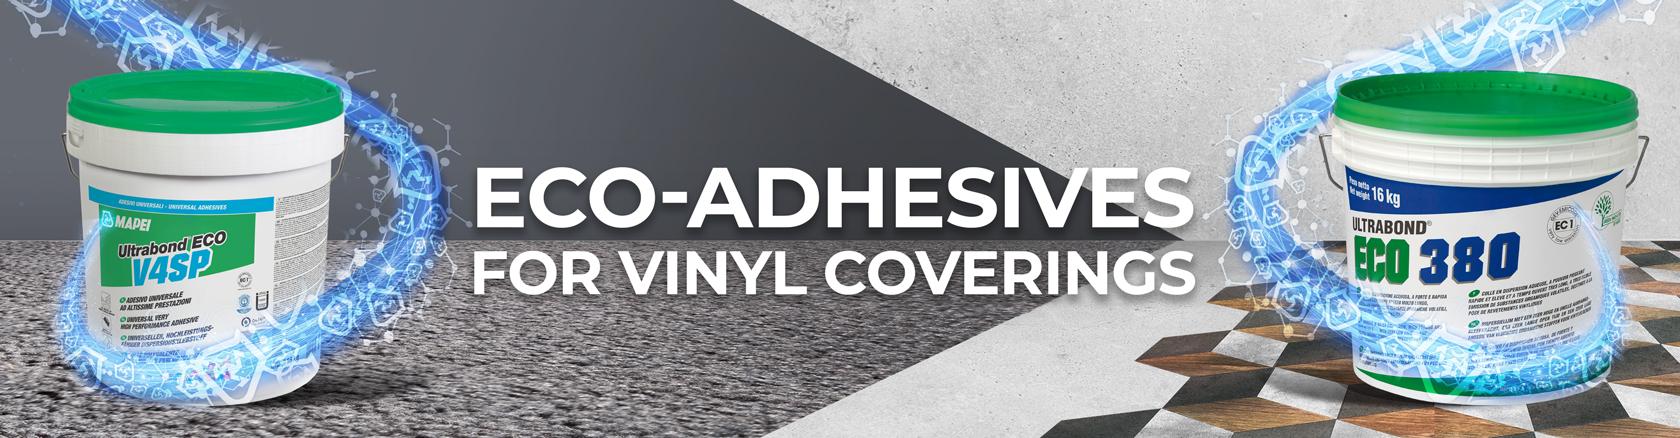 Eco-adhesives-for-vinyl-floorings-in-singapore